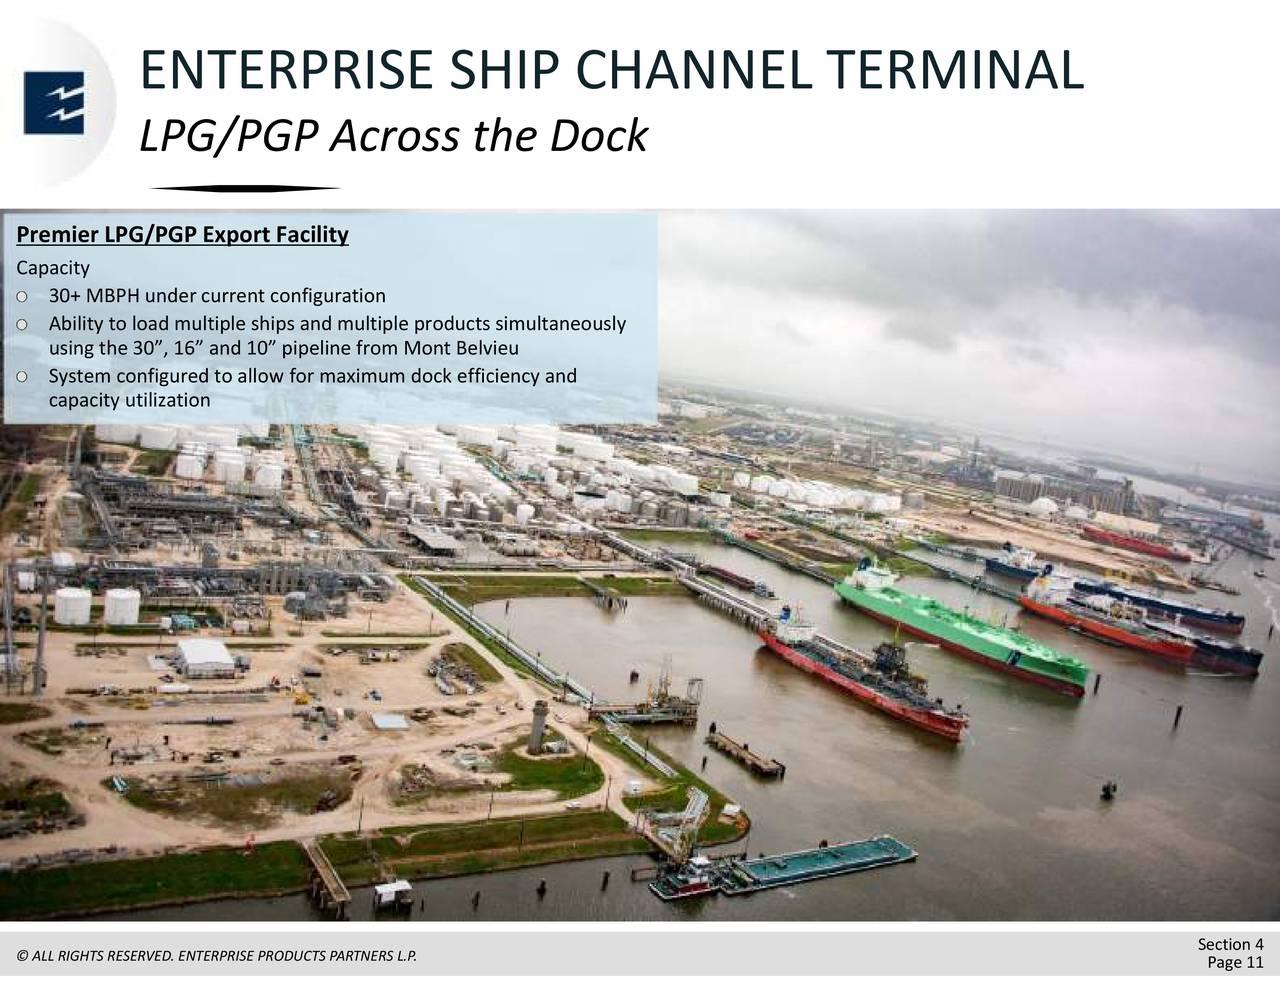 Enterprise Products Partners (EPD) Investor Presentation - Slideshow